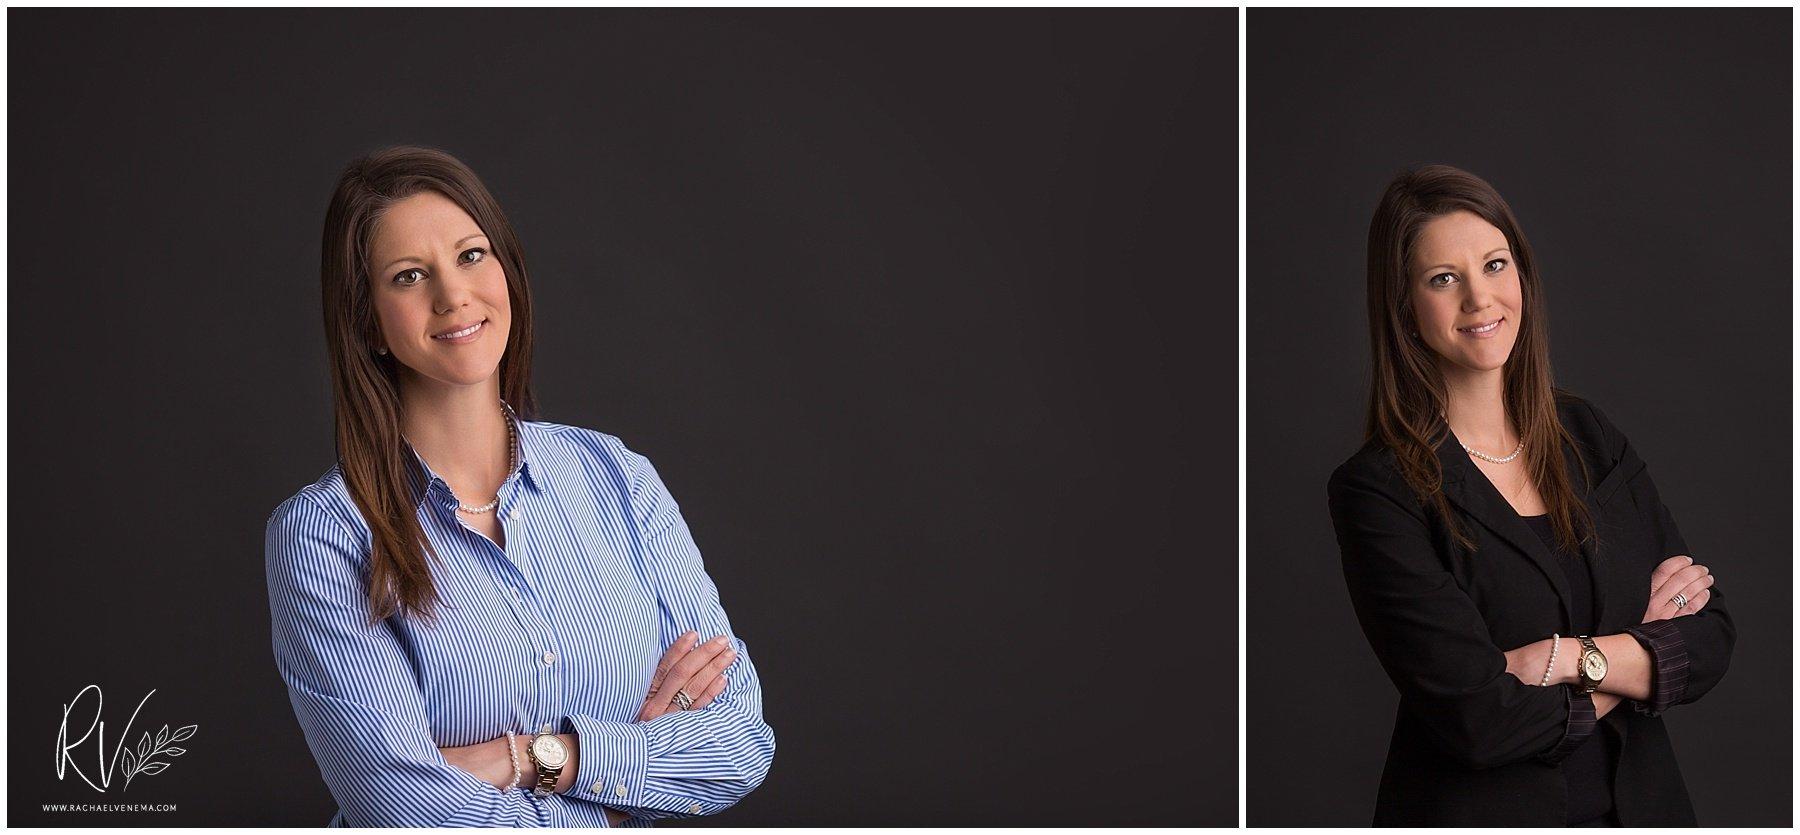 Ripon Headshots, Ripon CA, Ripon CA Business, Ripon CA Business Photos, Ripon CA Corporate Headshots, Ripon Corporation, Ripon CA Commercial Photos, Ripon CA Business Photographer, Ripon Business Photographer, Ripon CA Business Pictures, Ripon CA Corporate Pictures, Headshot Photographer Ripon CA